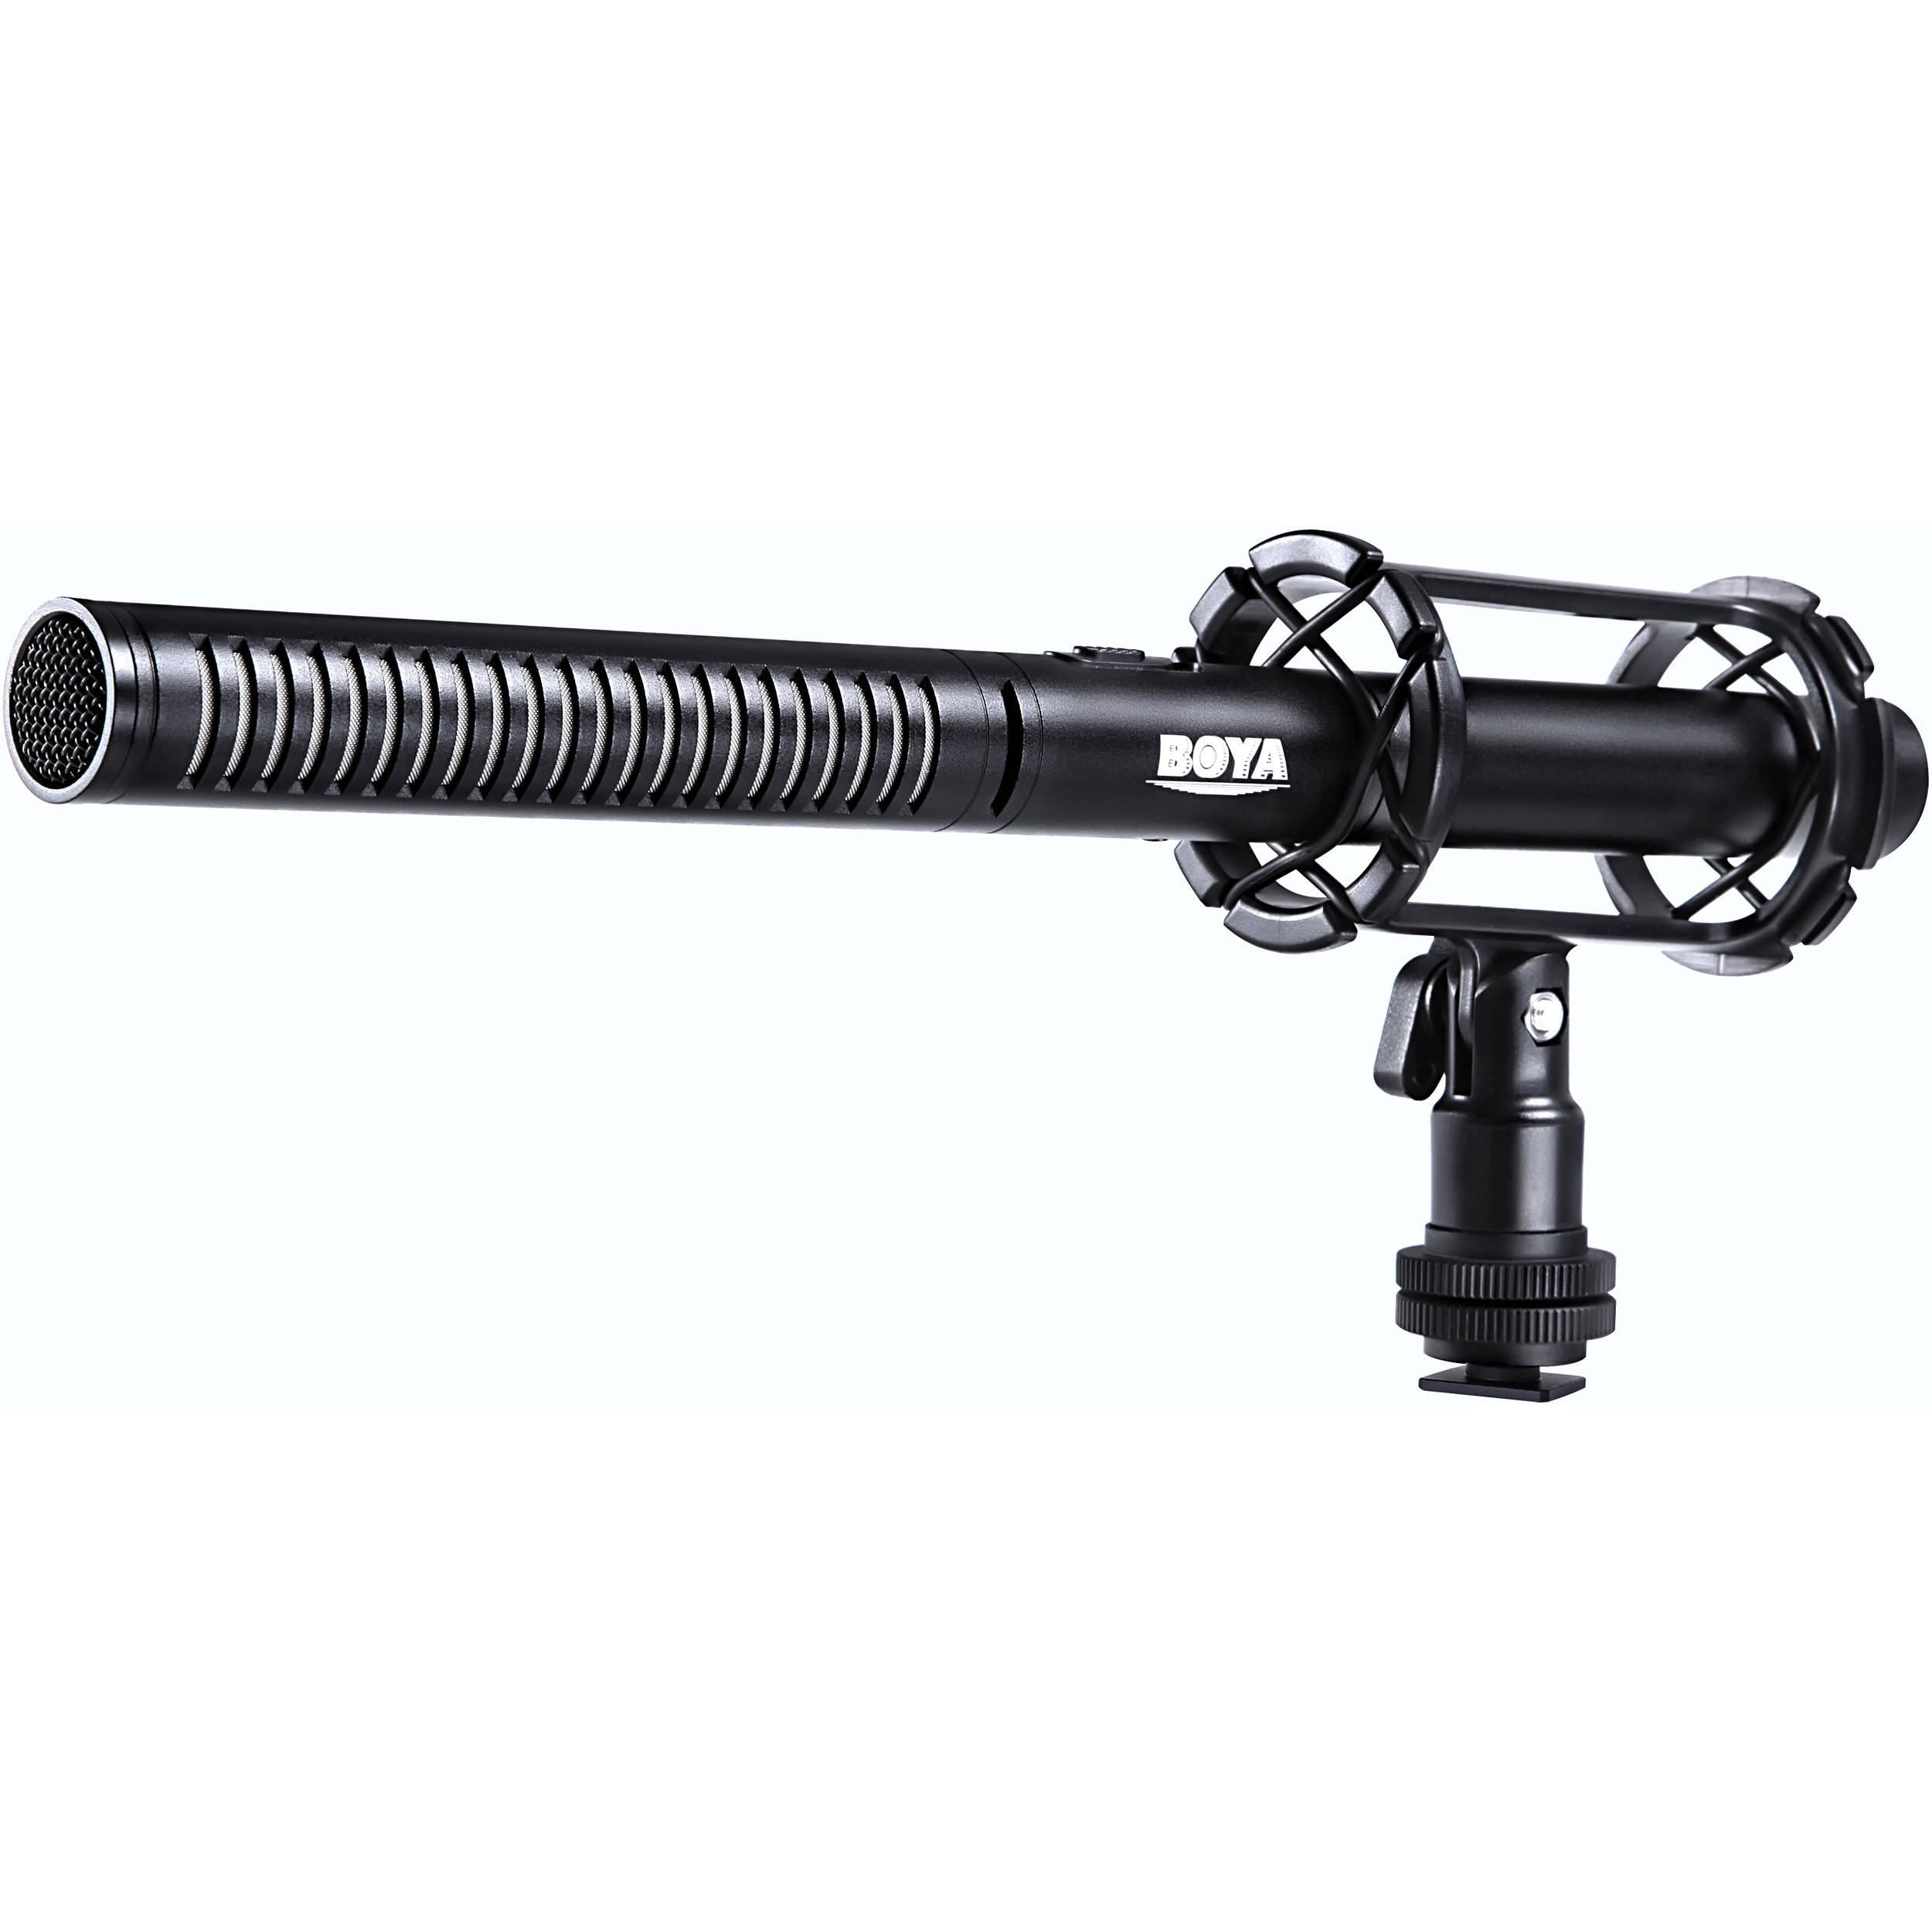 Boya By Pvm1000 Professional Shotgun Microphone By Pvm1000 B H